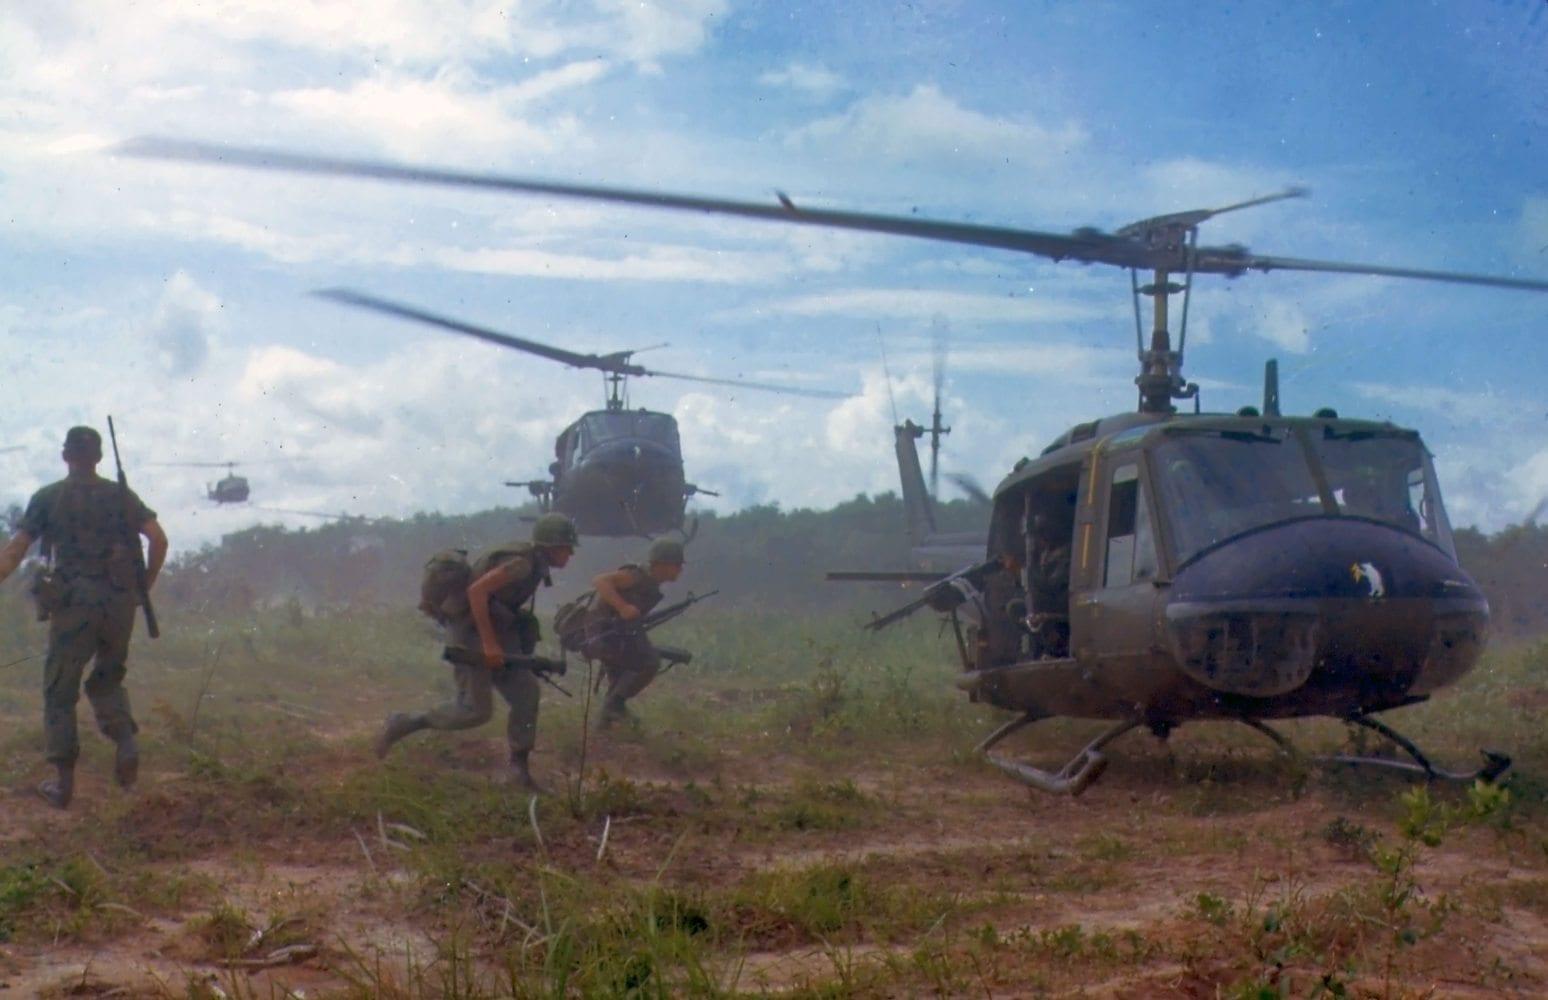 Vietnam War- Star Wars politics